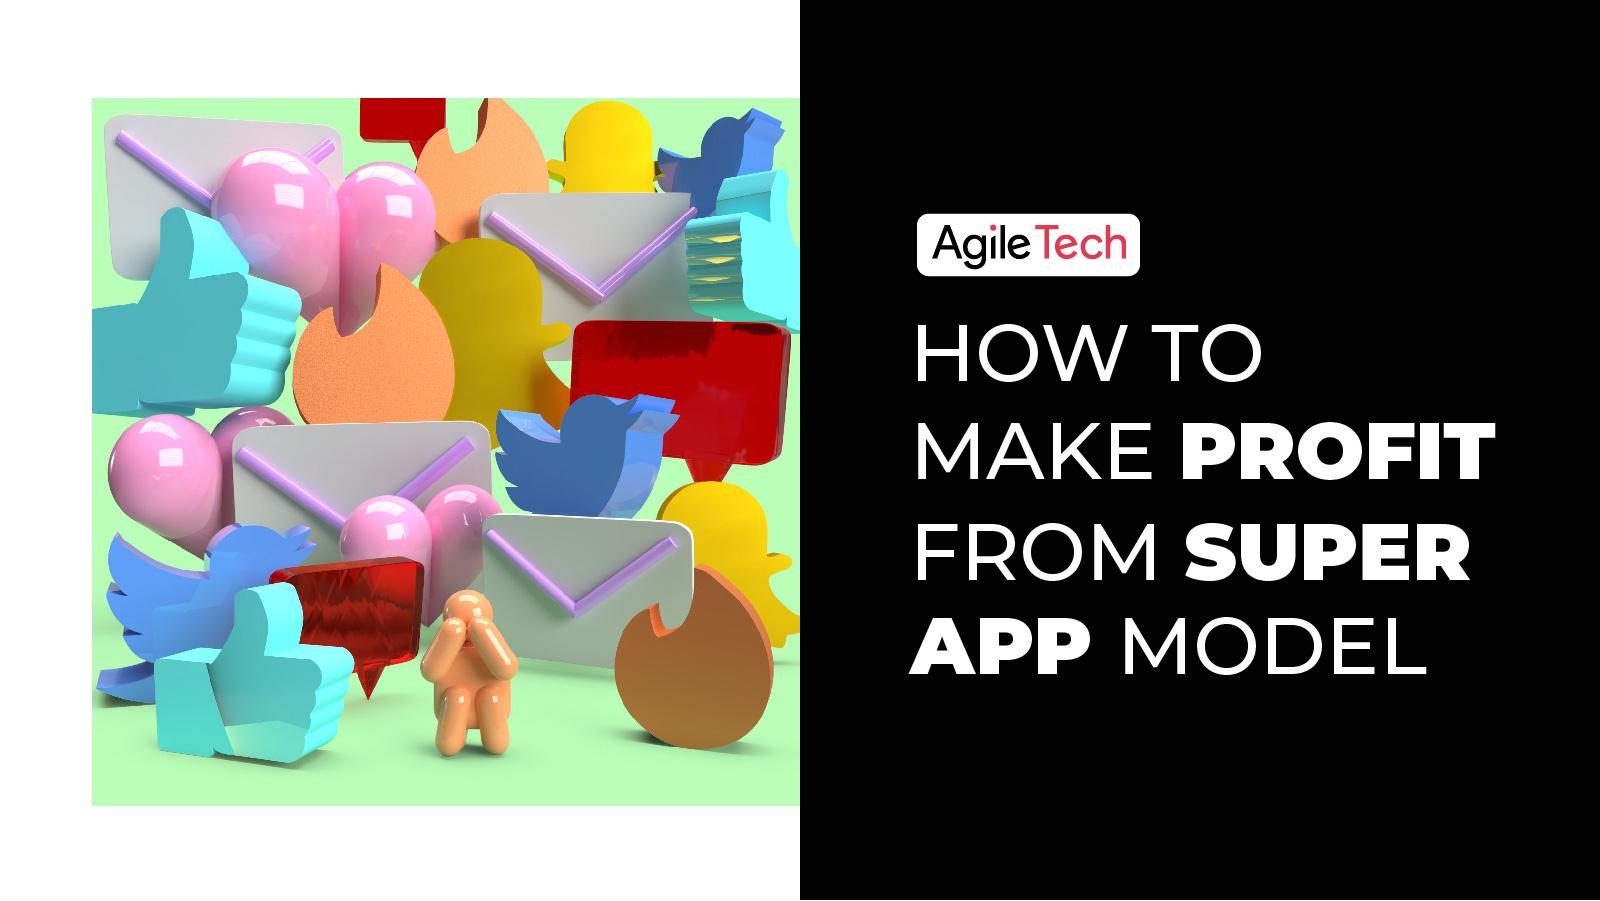 super app strategy, super app business model, list of successful super app, how to get profit from super app model, agiletech